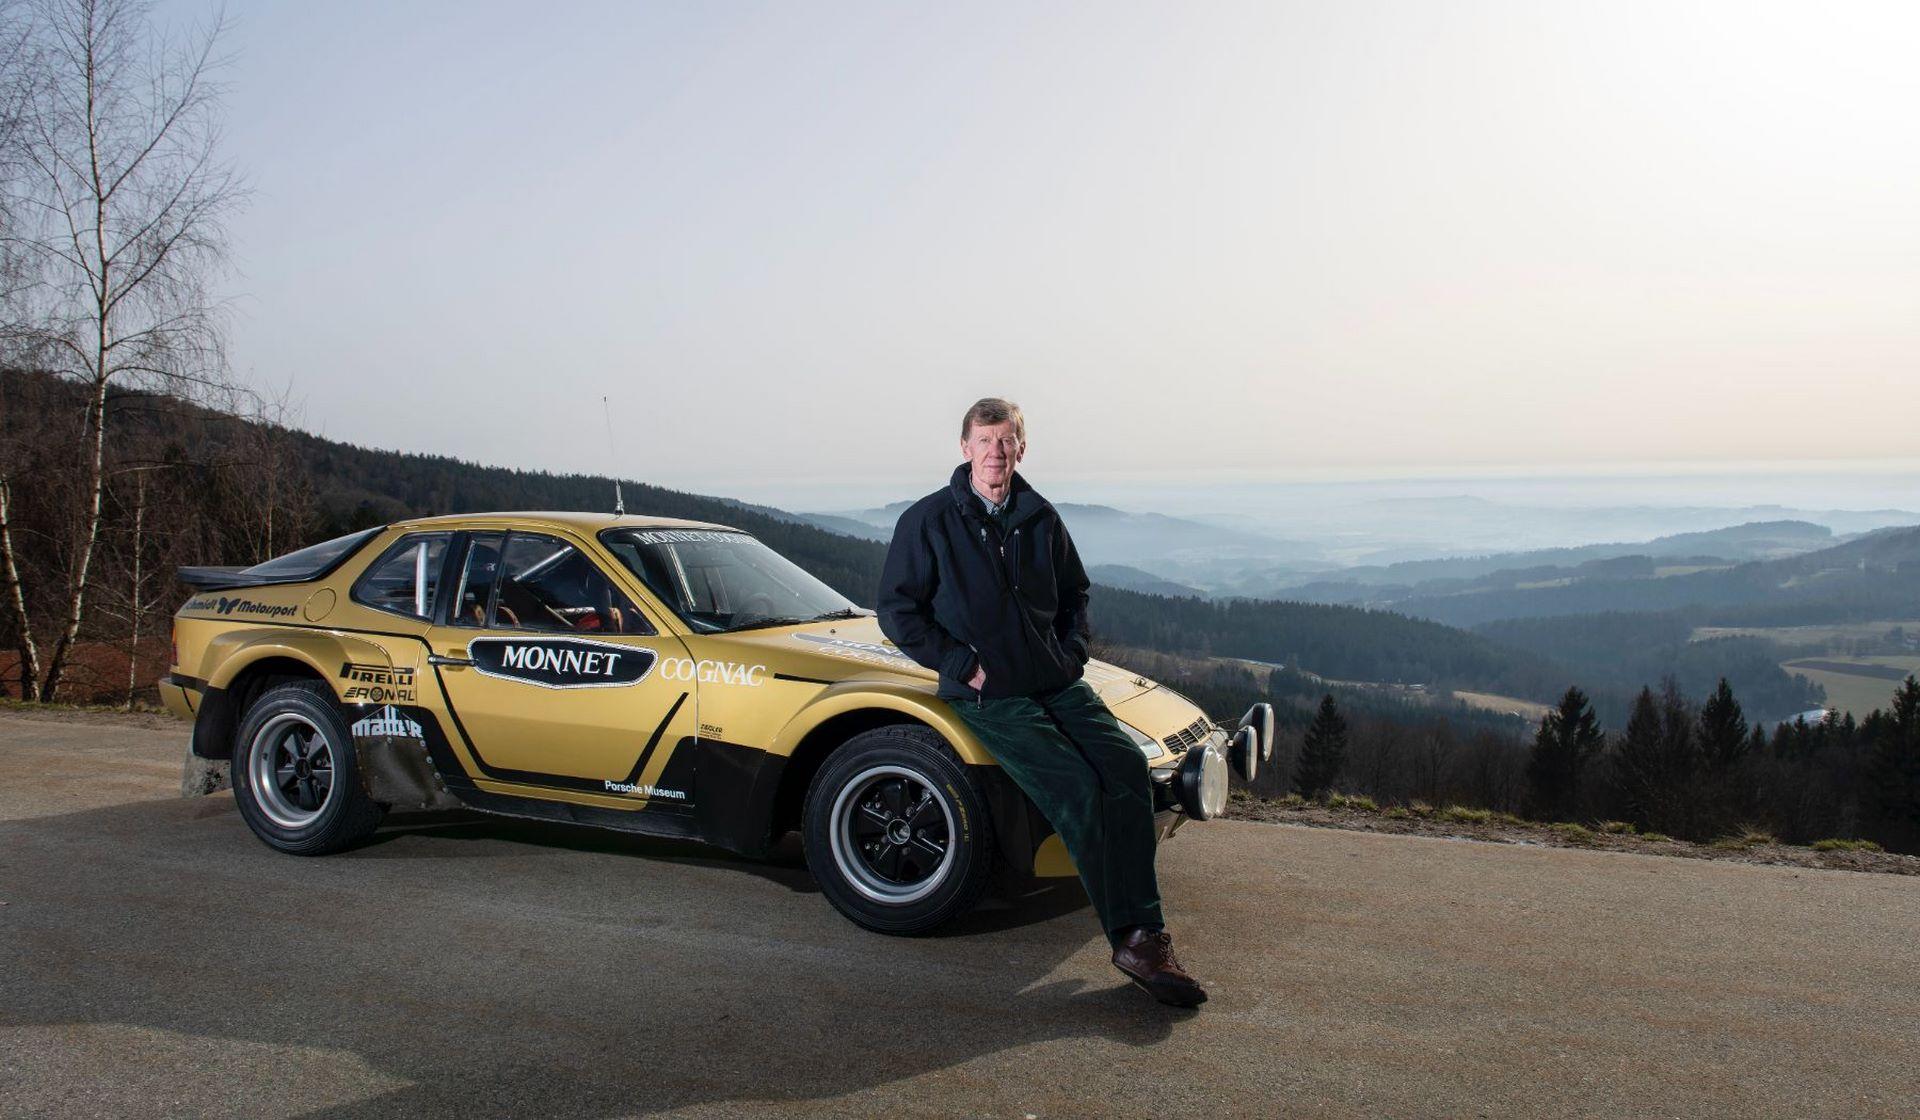 Porsche-924-Carrera-GTS-rally-car-Walter-Rohrl-12